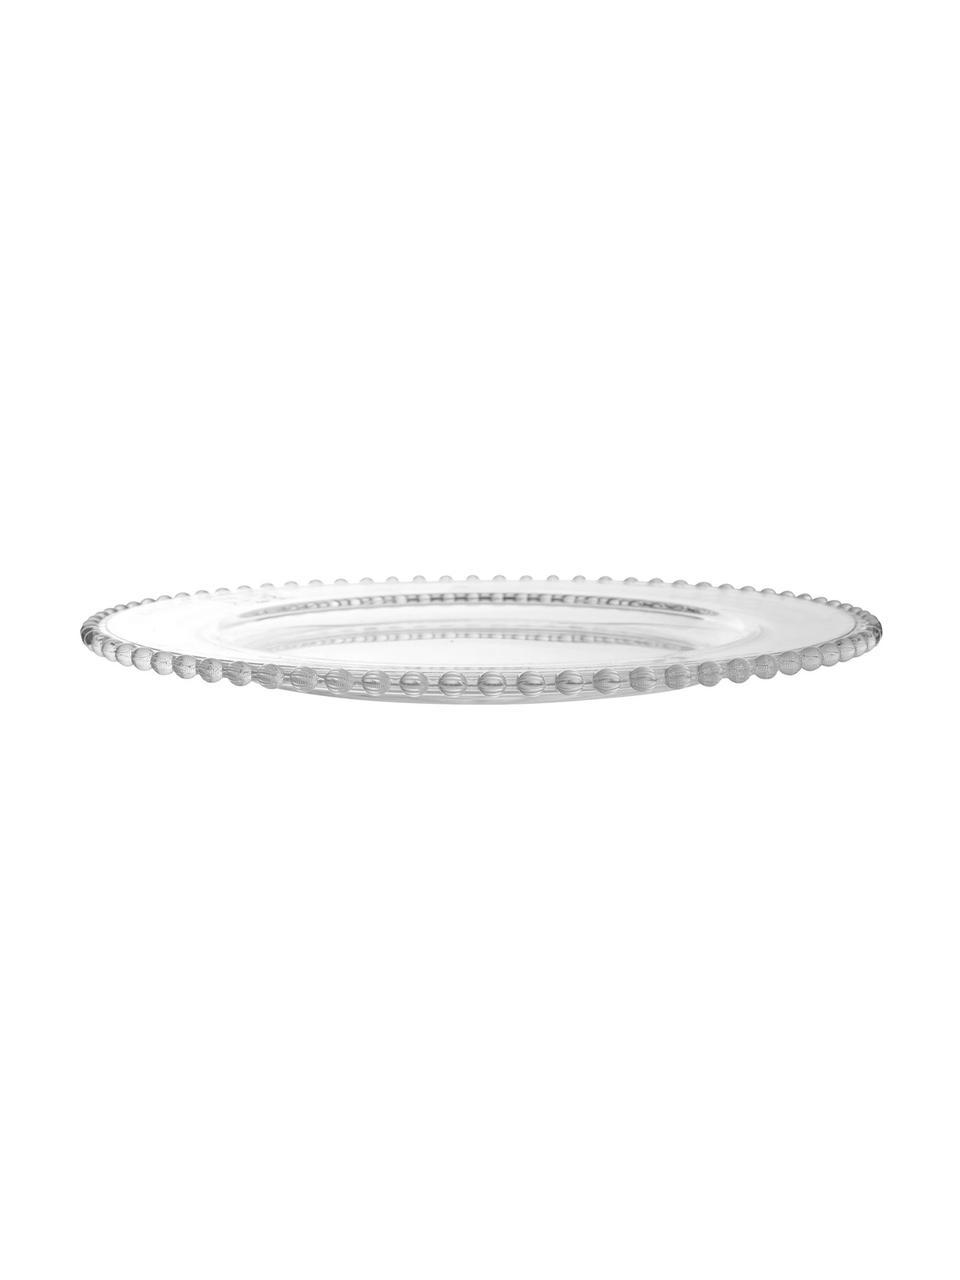 Glas-Platzteller Perles, Glas, Transparent, Ø 33 cm